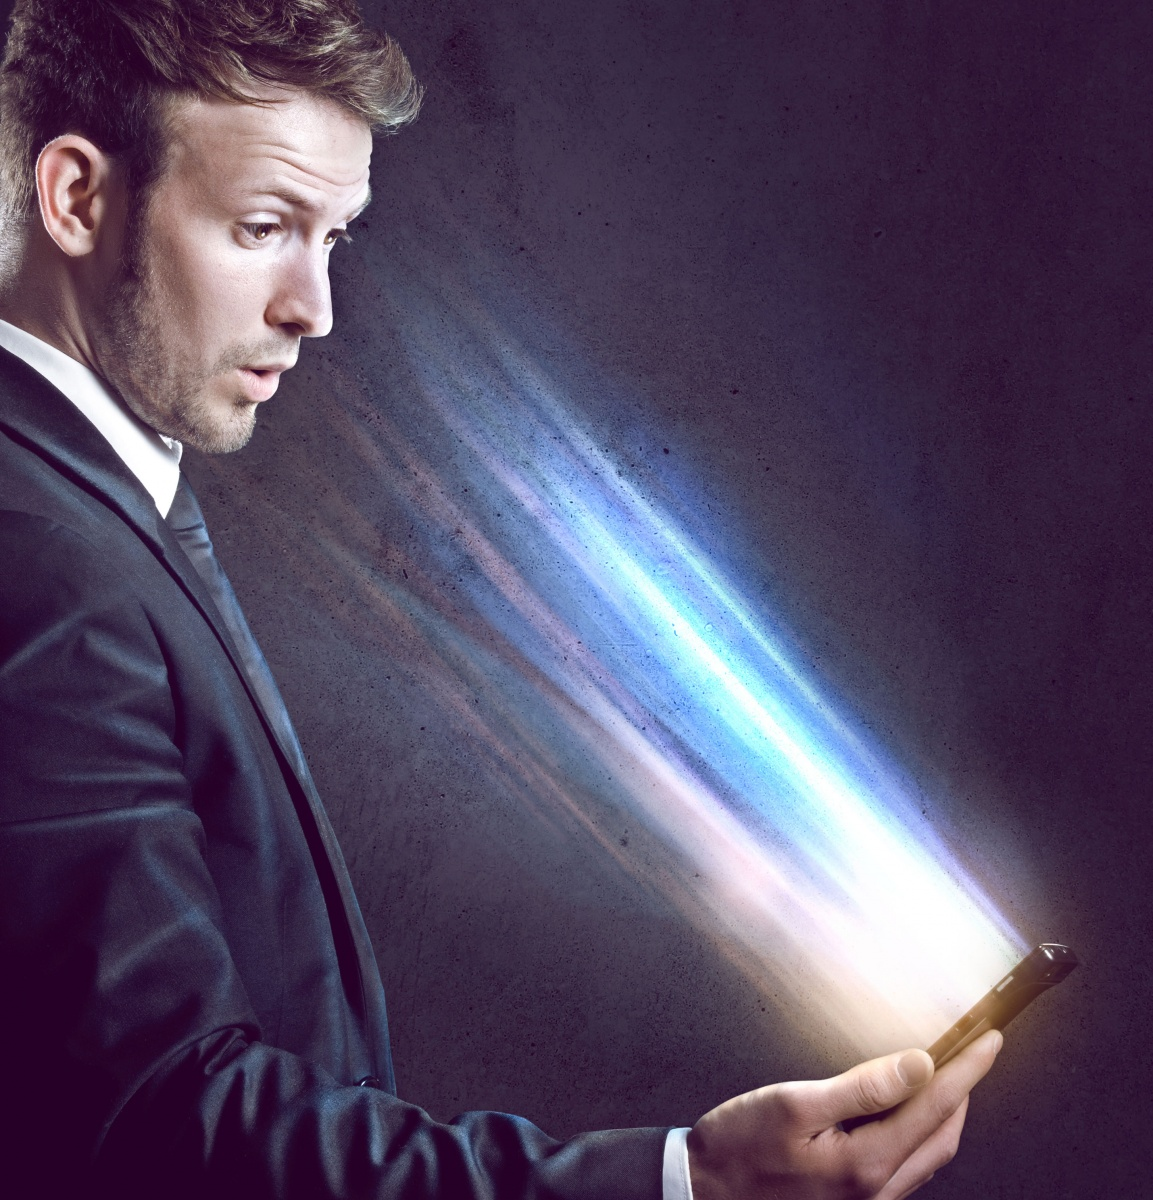 man smartphone revived